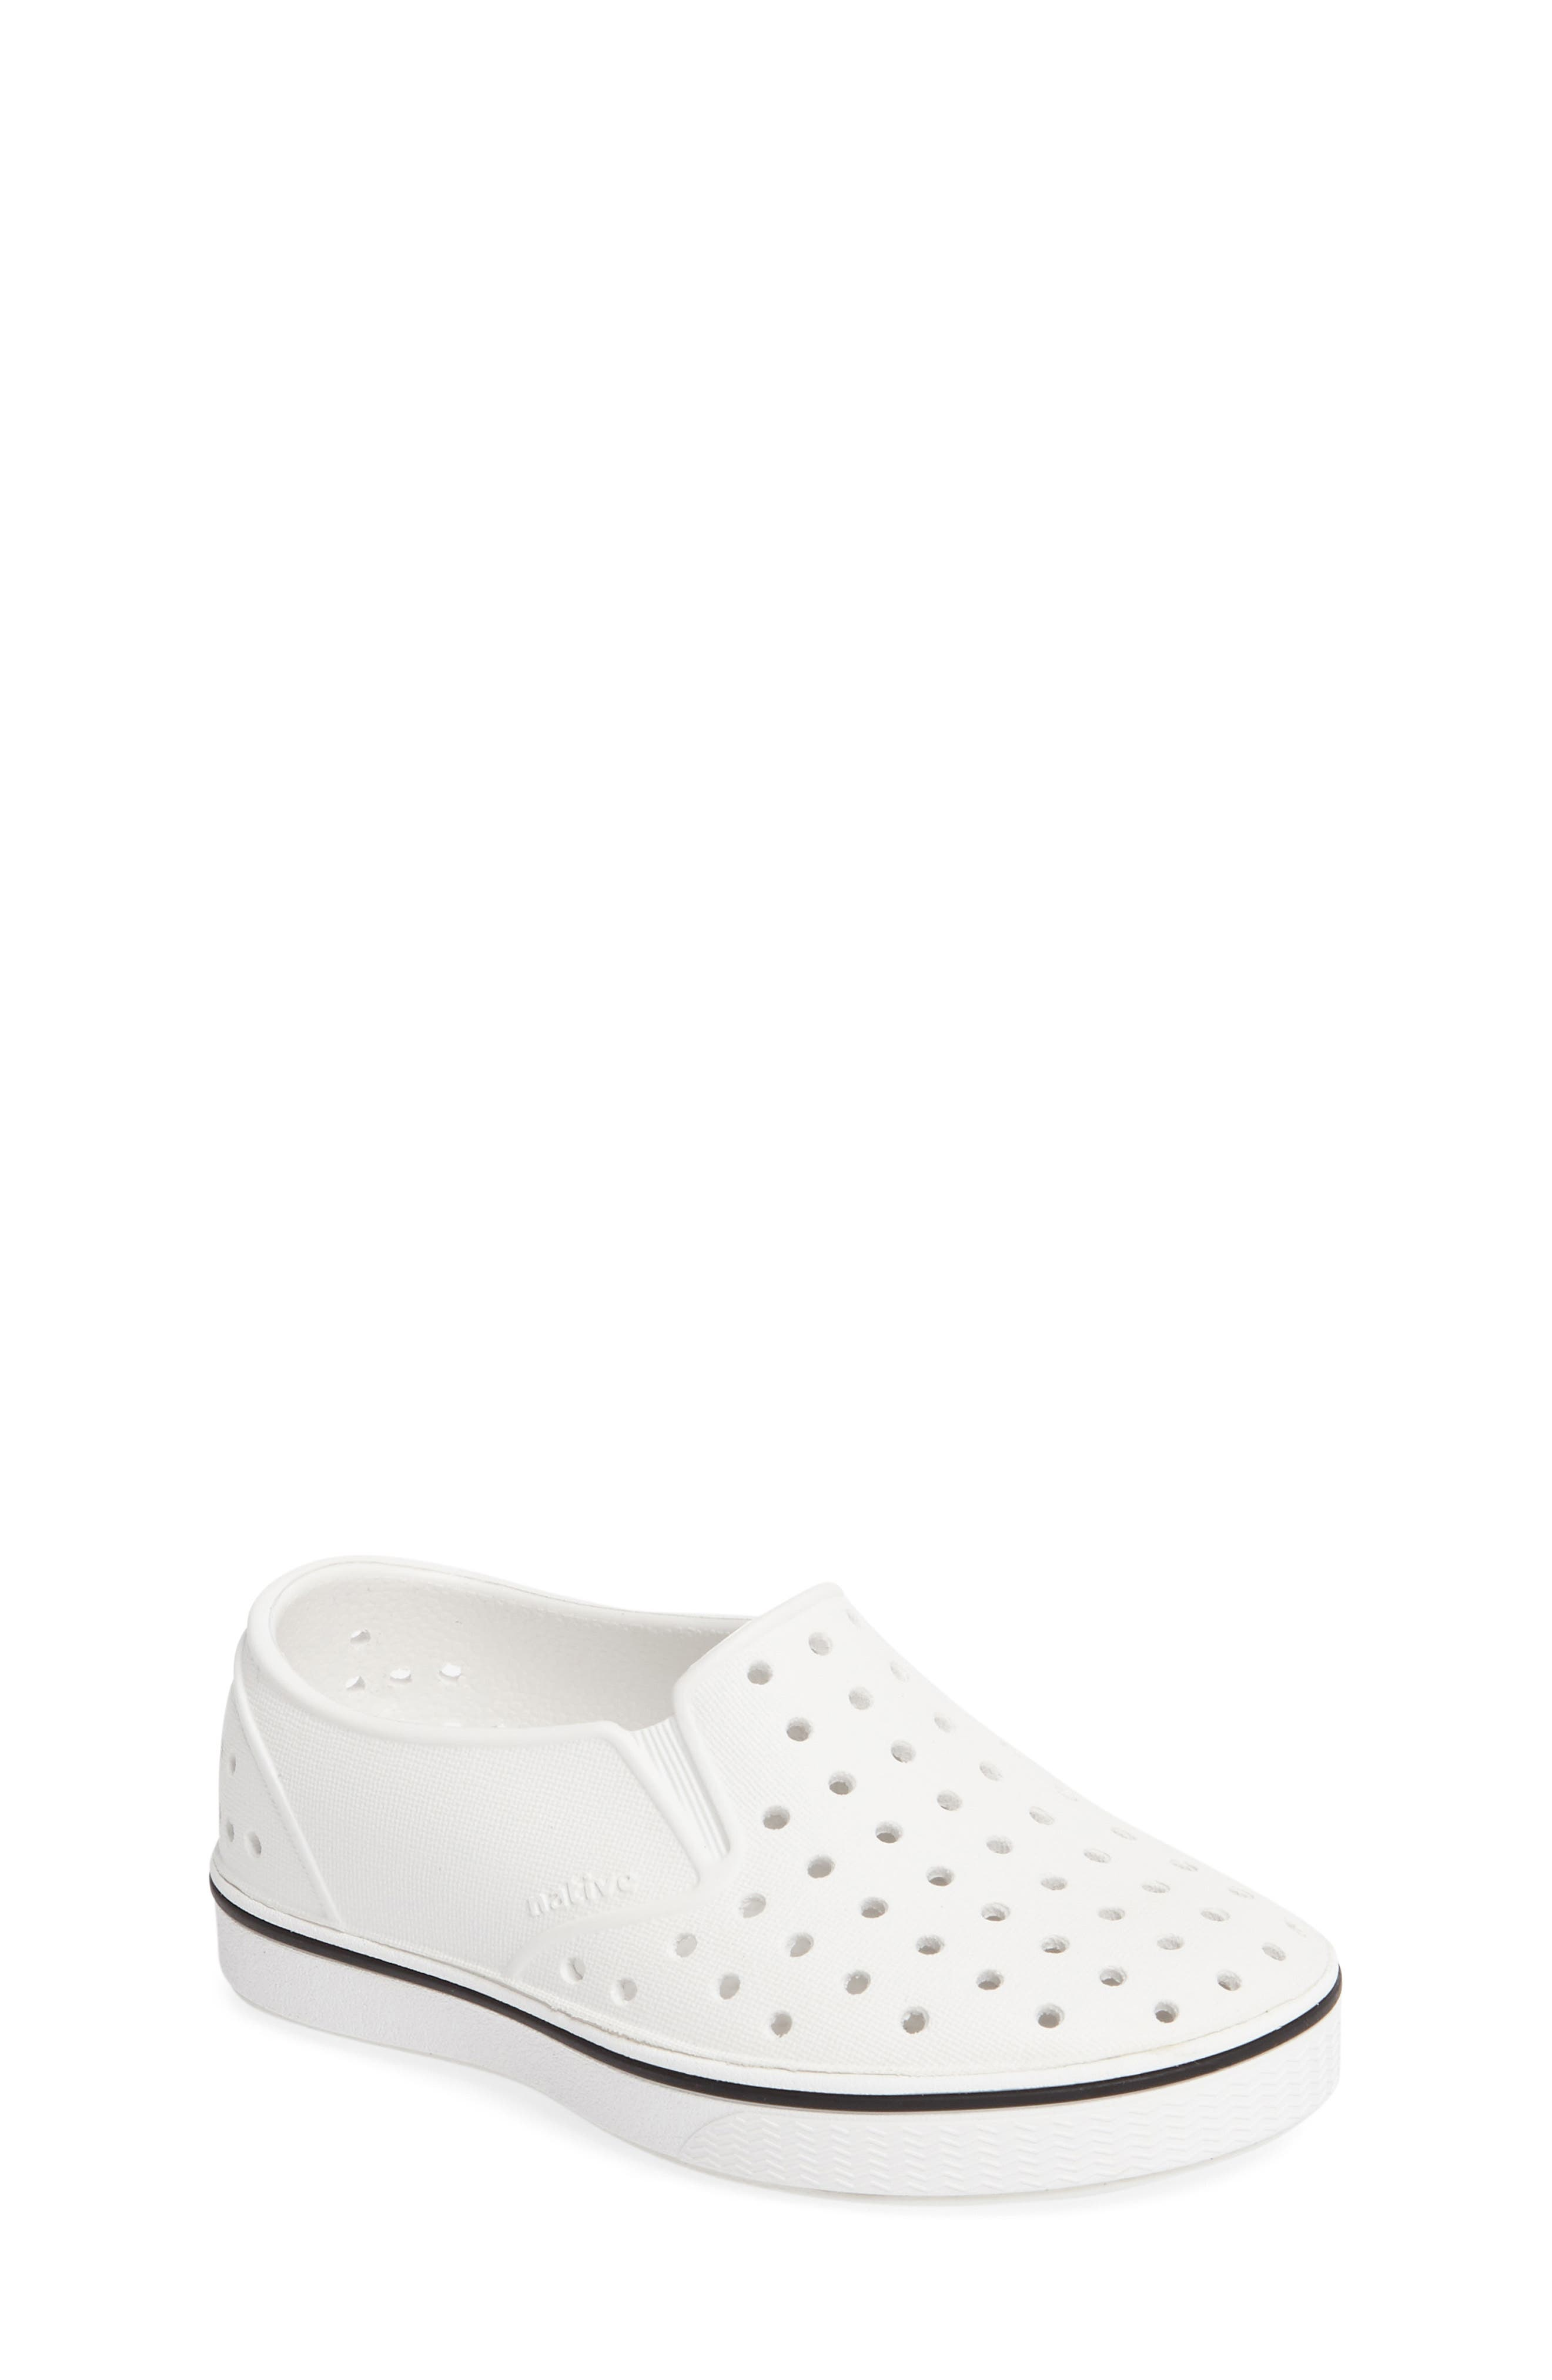 Native Shoes Miles Water Friendly Slip-On Sneaker (Baby, Walker, Toddler &